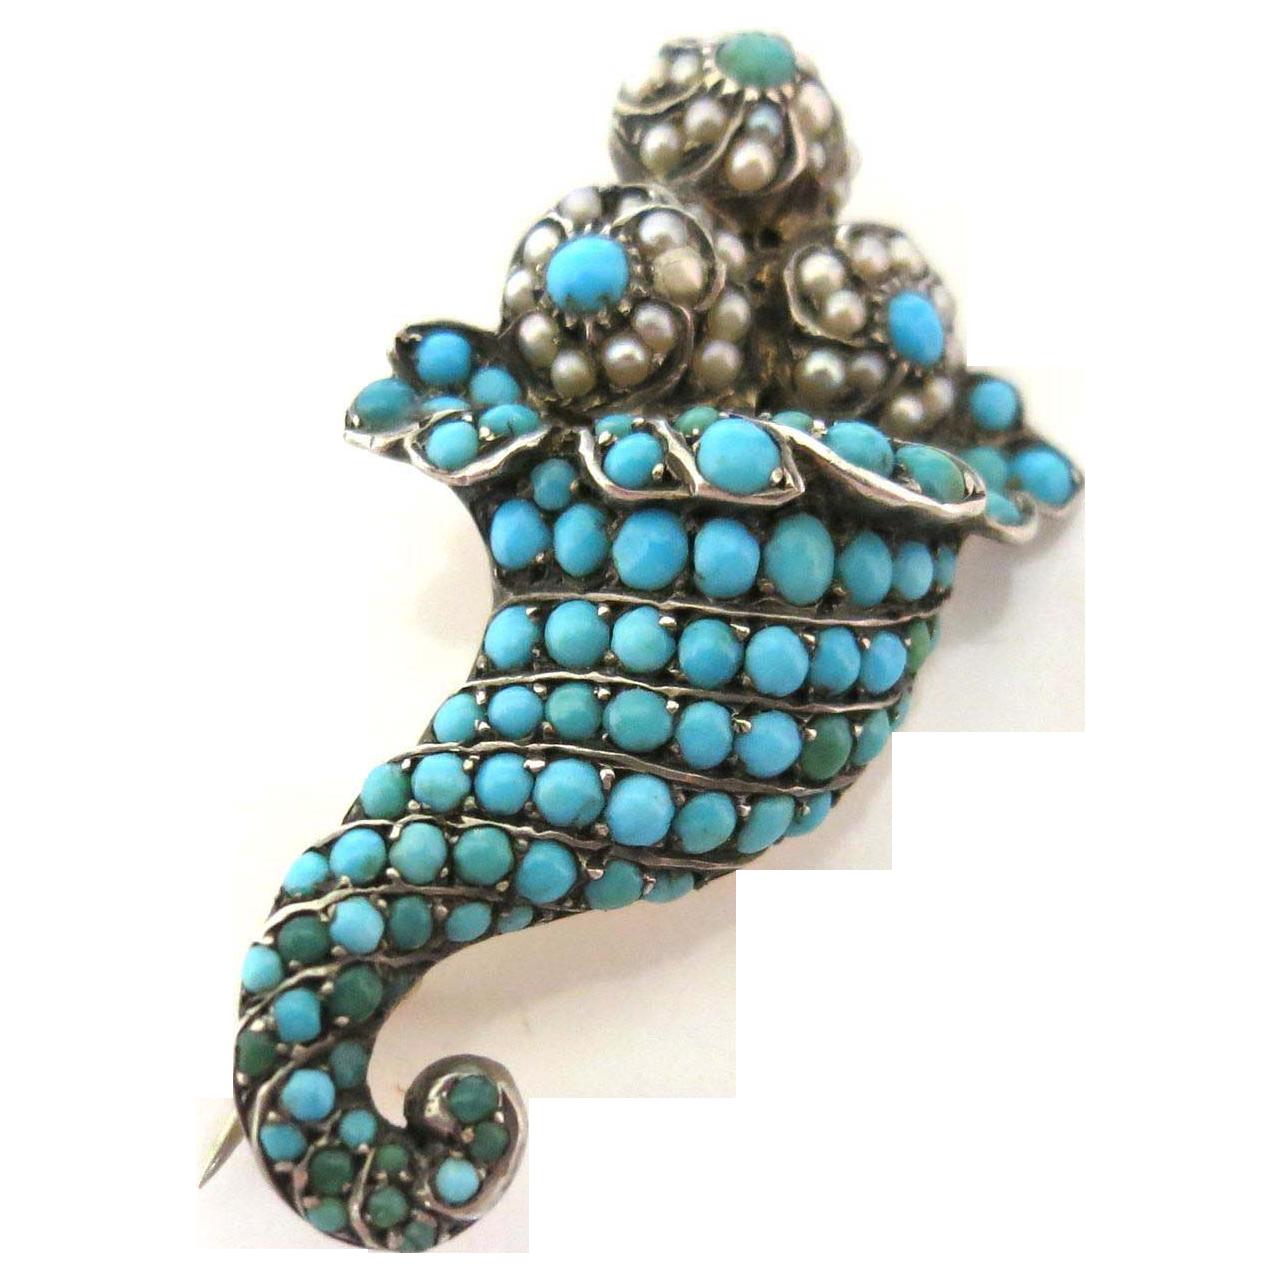 Jeweled Victorian Cornucopia Brooch in 15K Gold